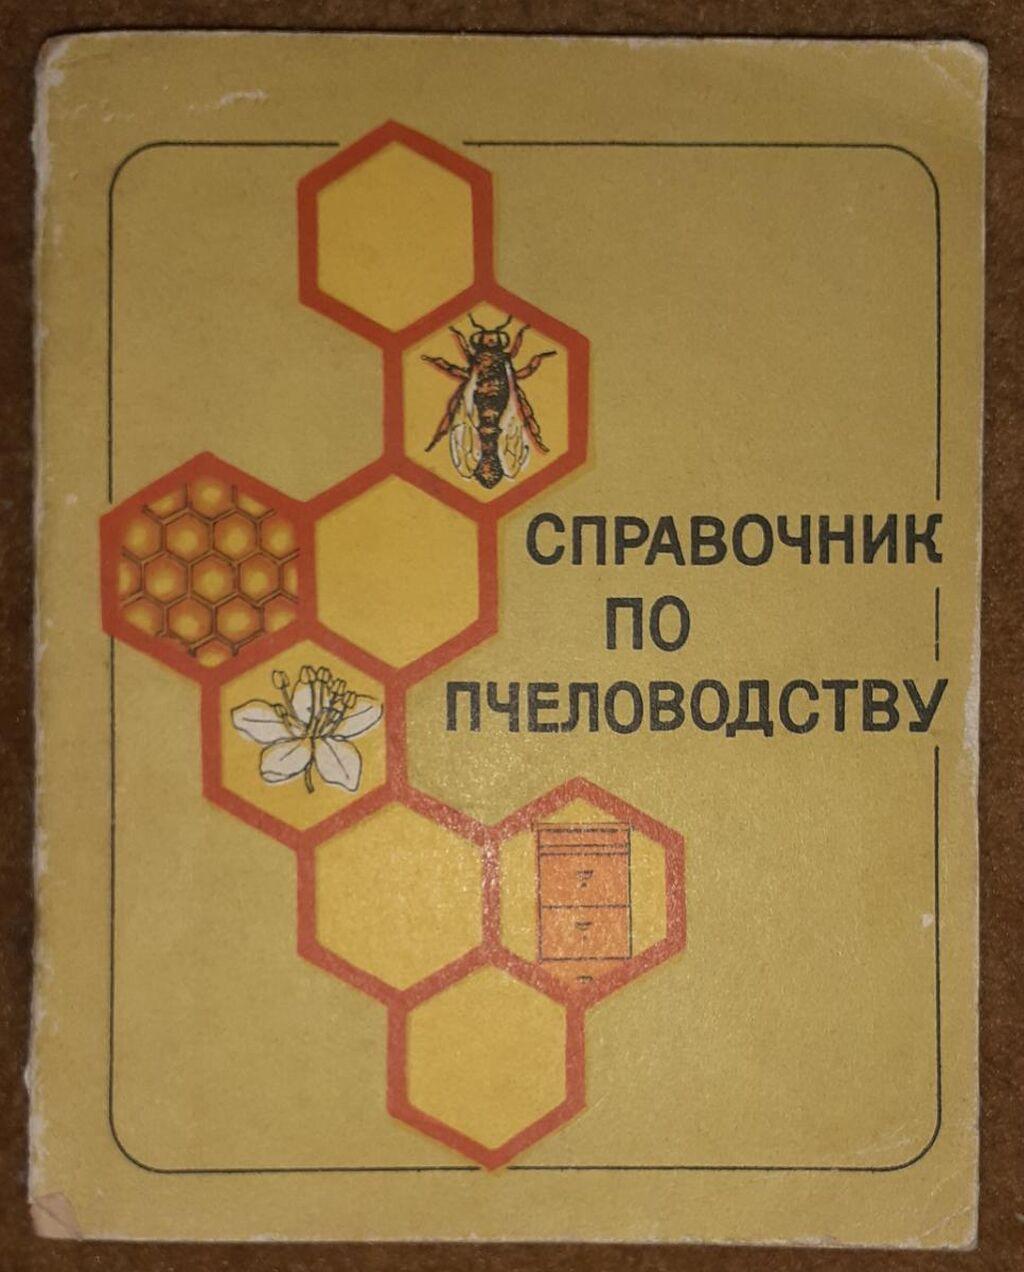 Книга справочник по пчеловодству, СССР 1979 год: Книга справочник по пчеловодству, СССР 1979 год